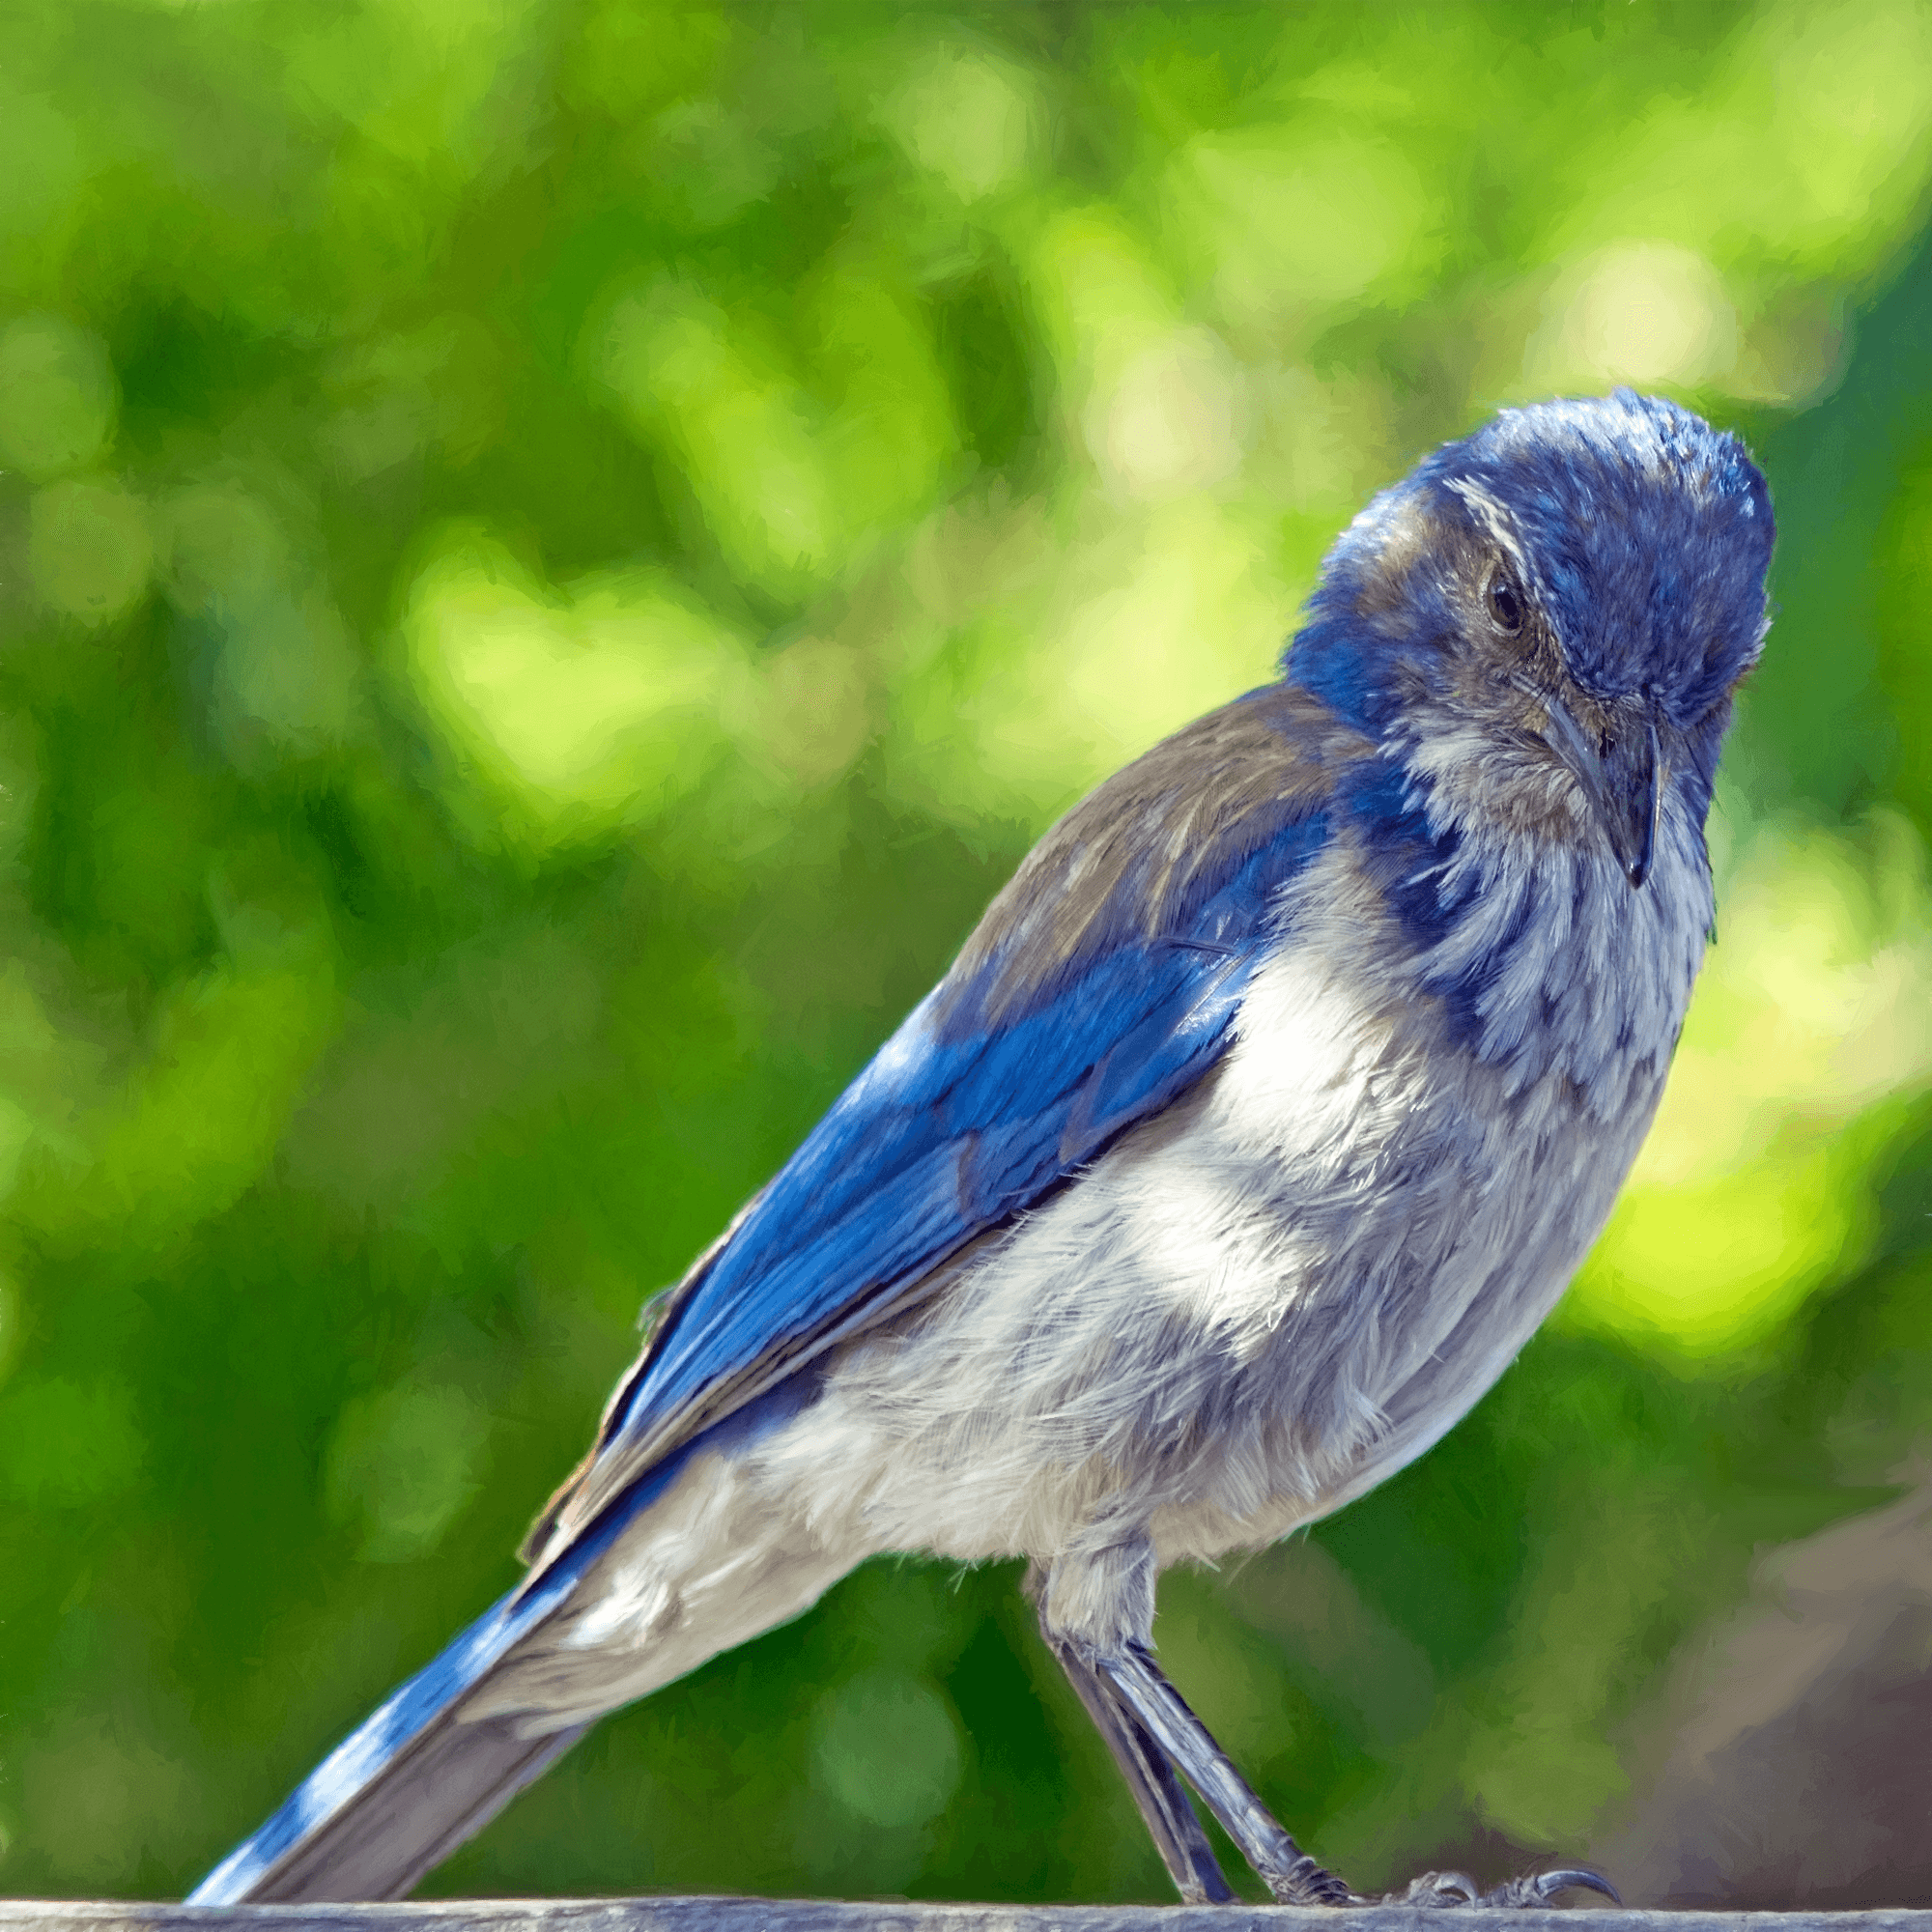 blue and gray bird